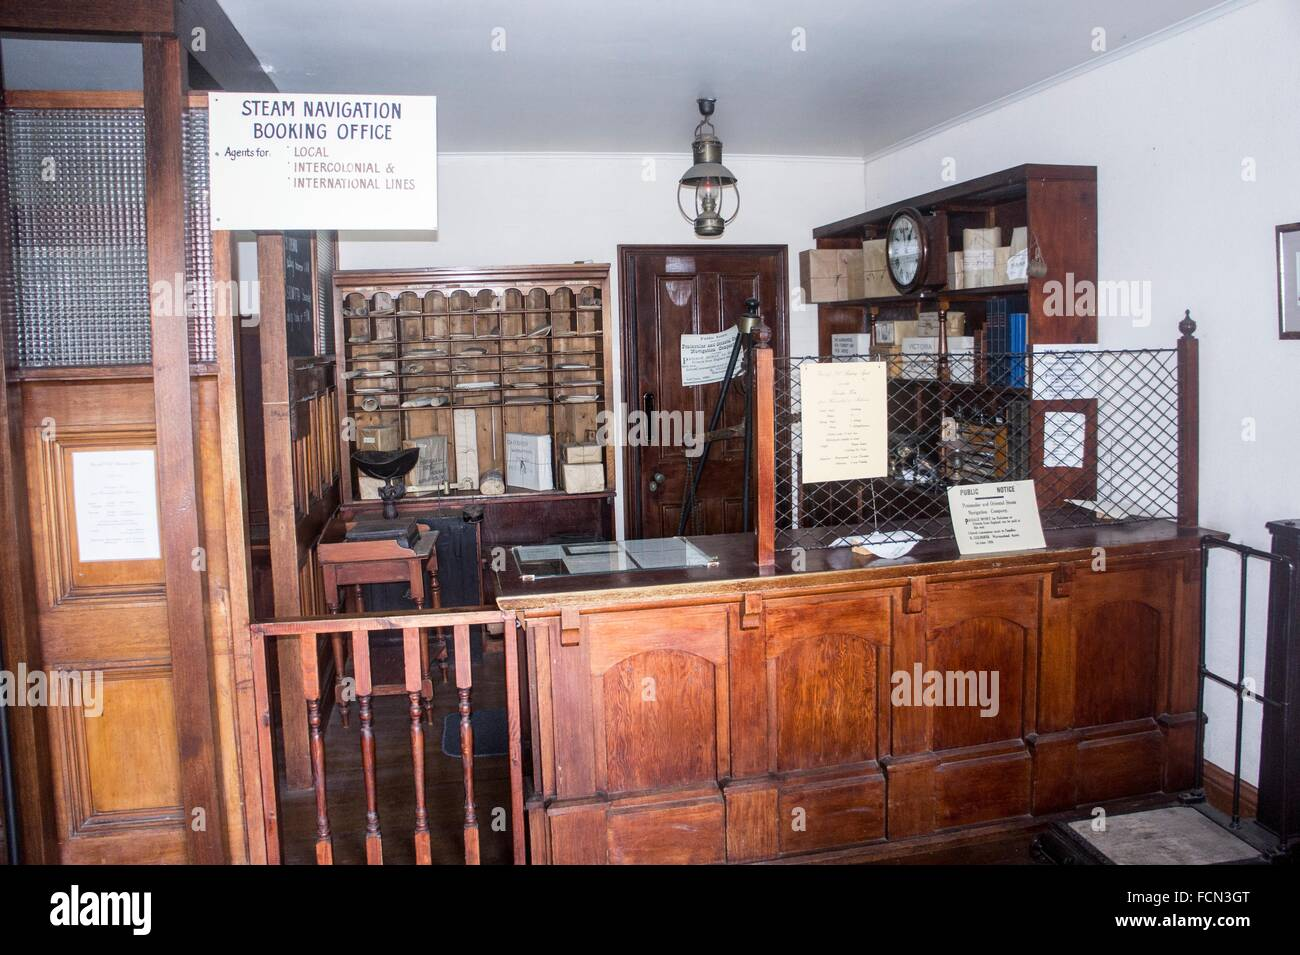 Replica steam navigation office, Flagstaff Hill, Warrnambool, Australia - Stock Image